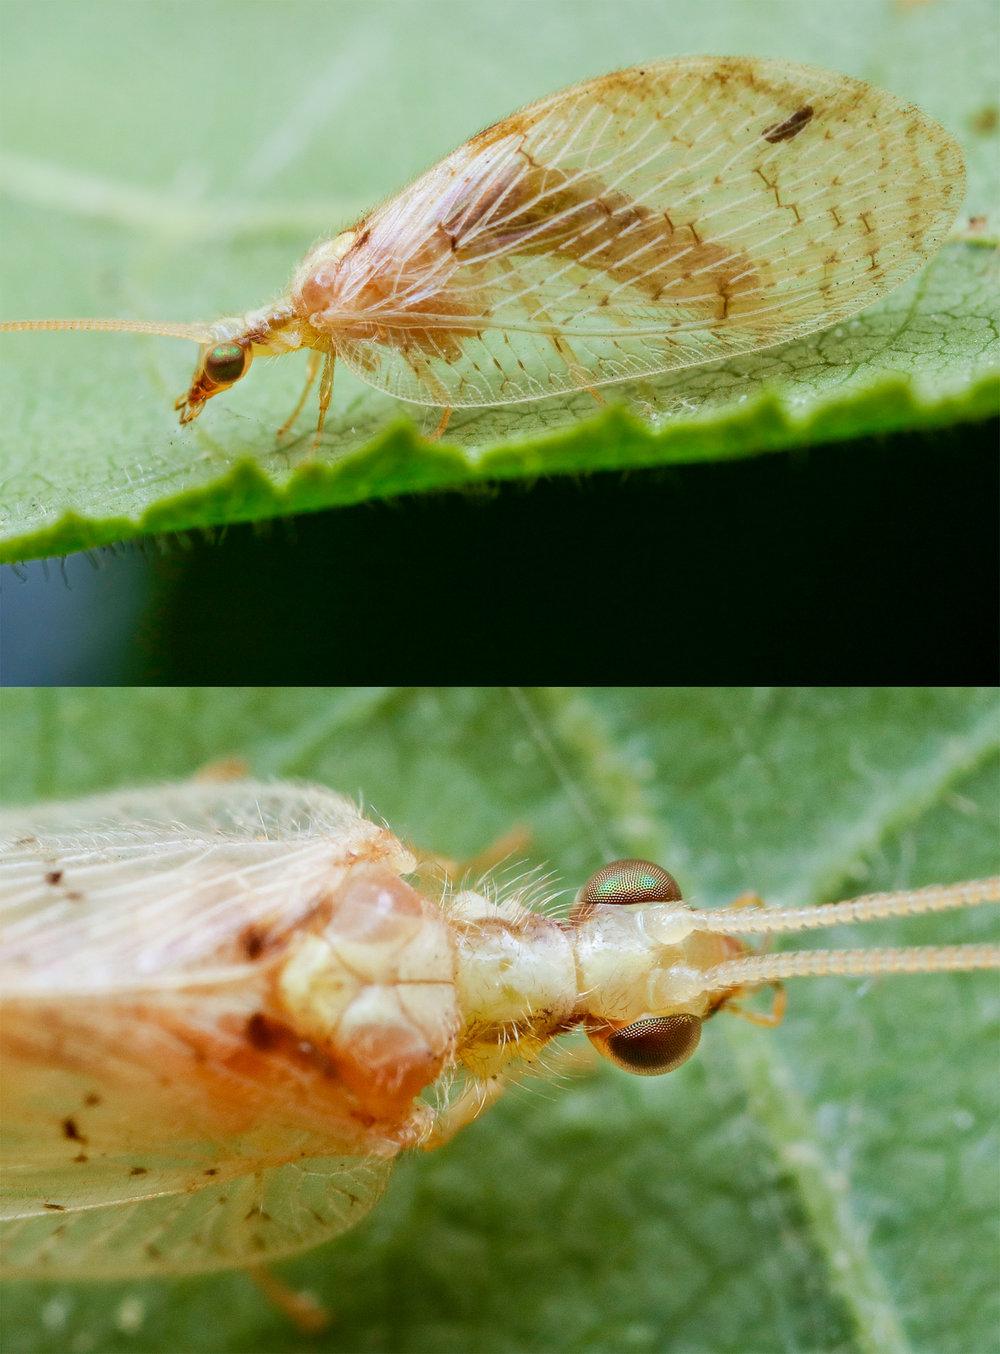 Hemerobius cf. marginatus, florslända